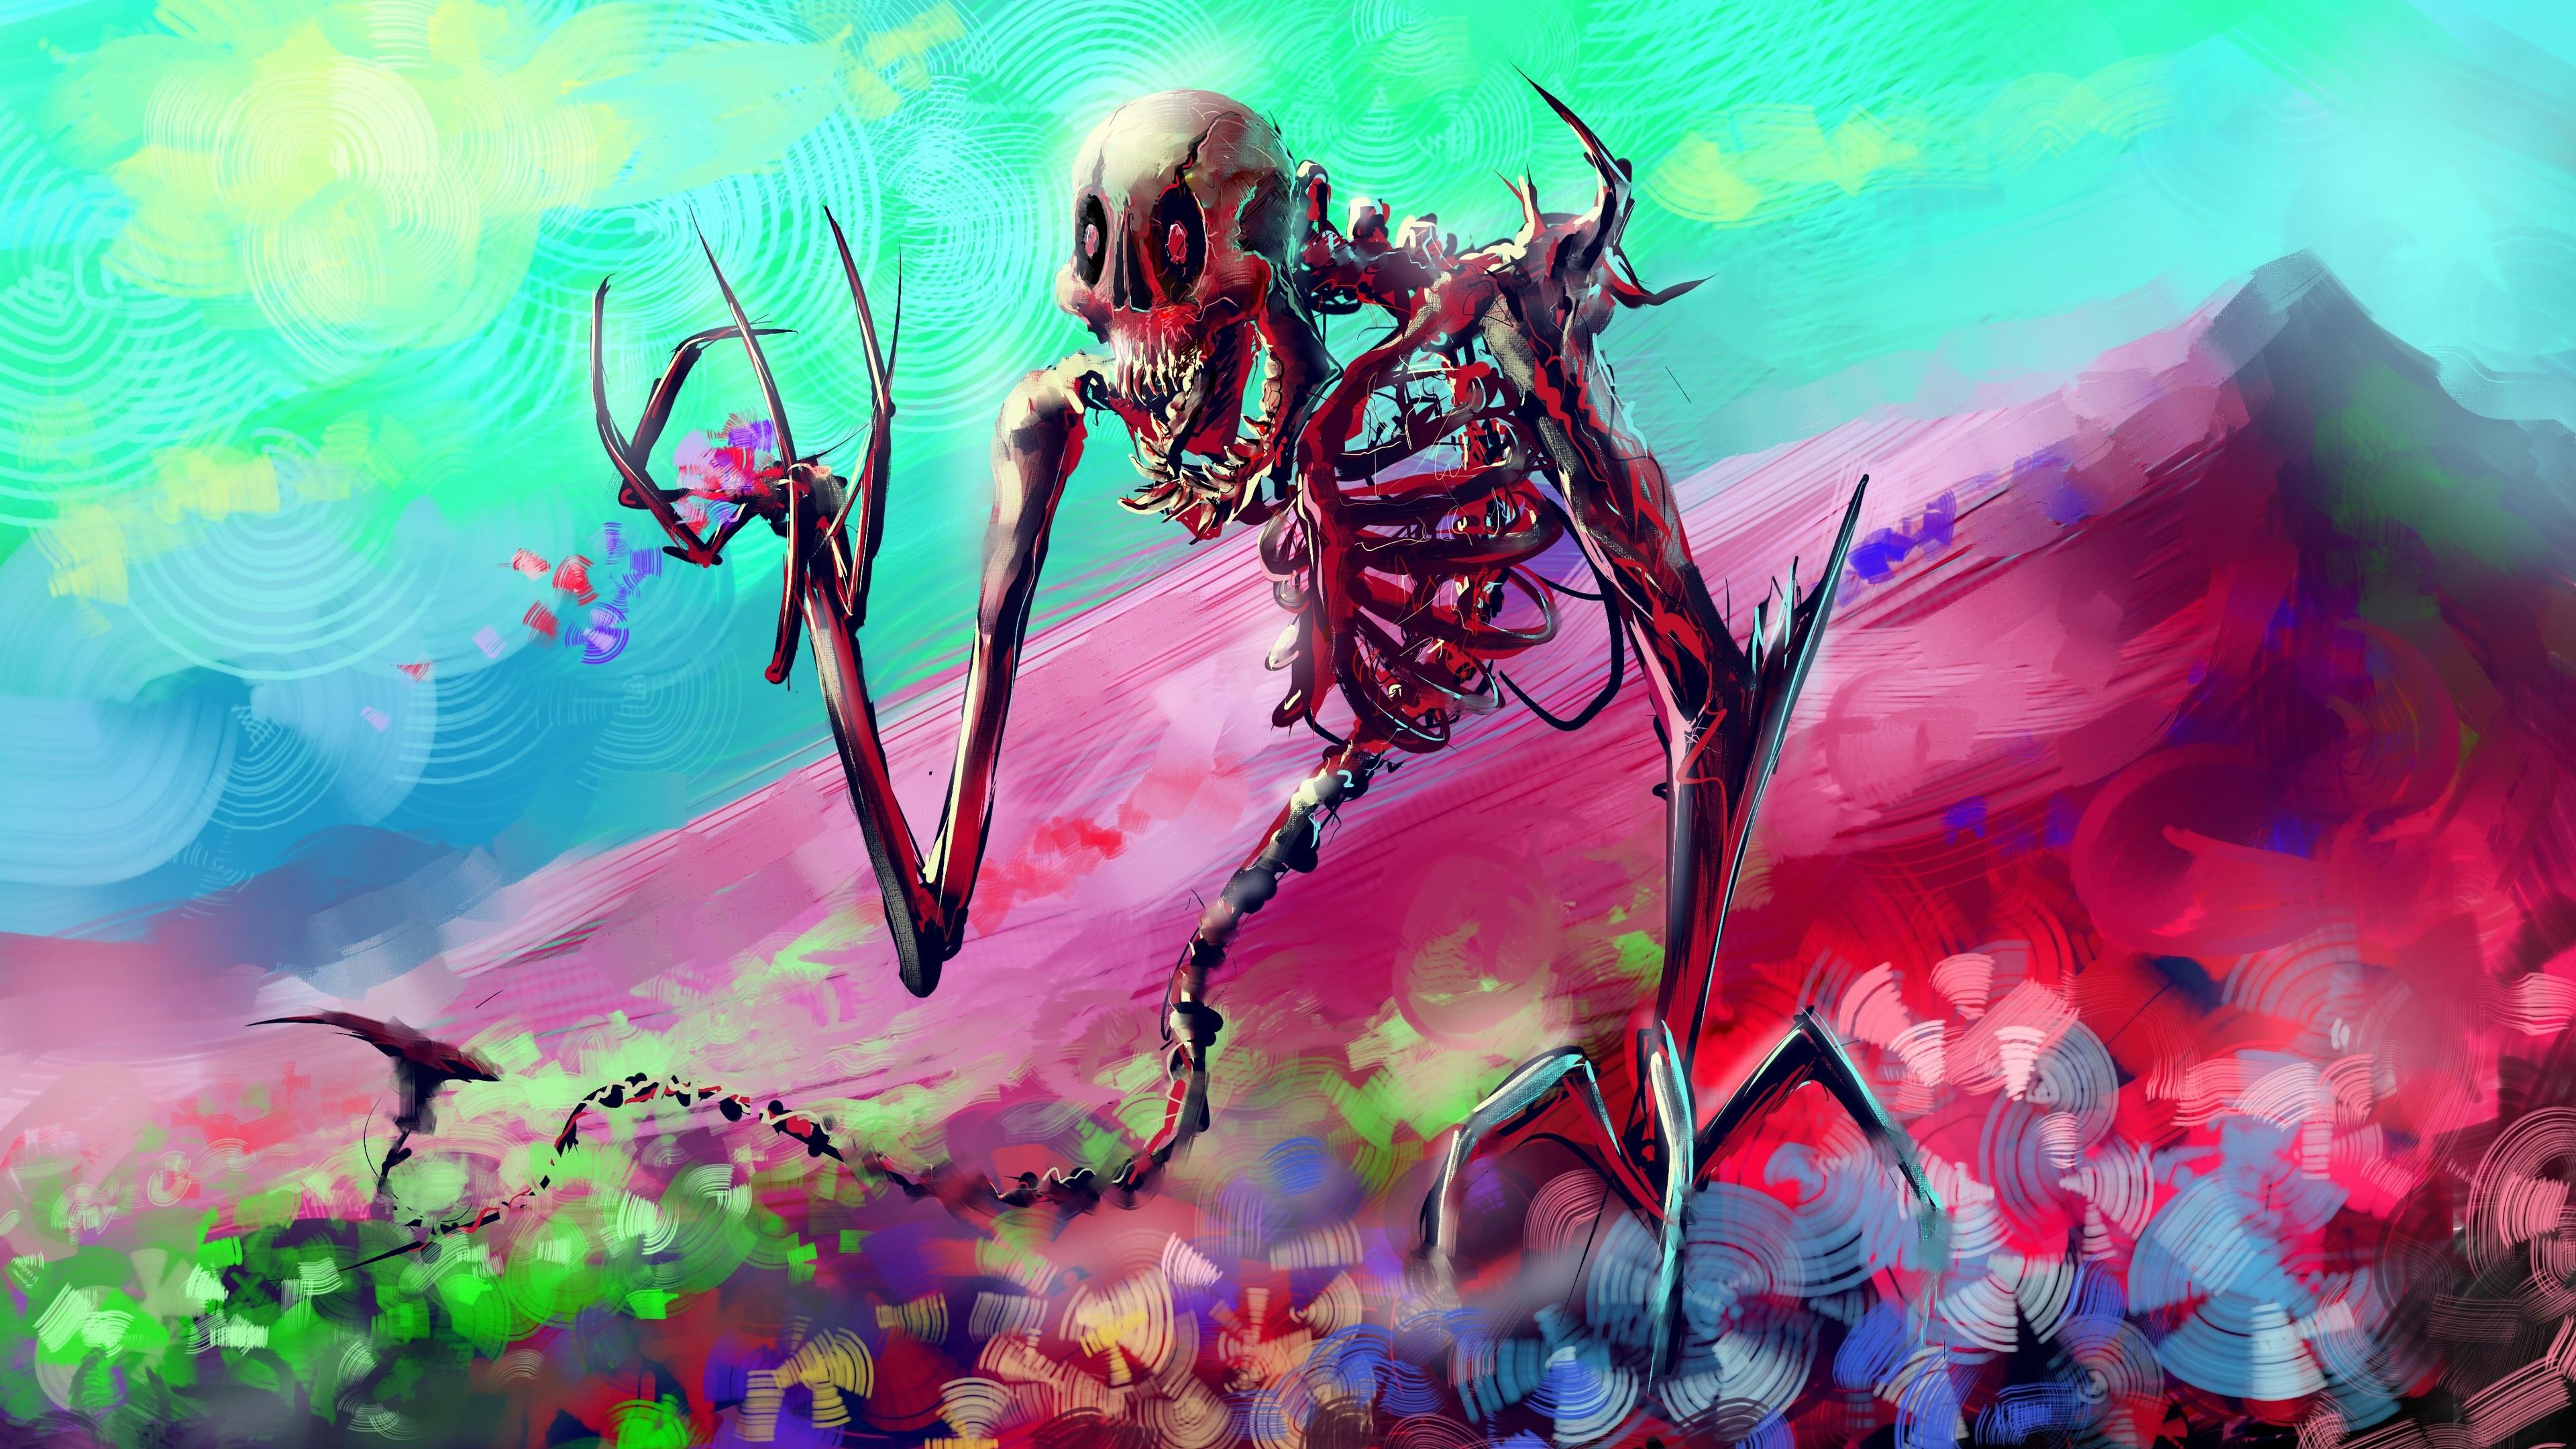 skelton skull colorful digital art 4k 1540751618 - Skelton Skull Colorful Digital Art 4k - skull wallpapers, skelton wallpapers, hd-wallpapers, digital art wallpapers, colorful wallpapers, artwork wallpapers, artist wallpapers, 4k-wallpapers